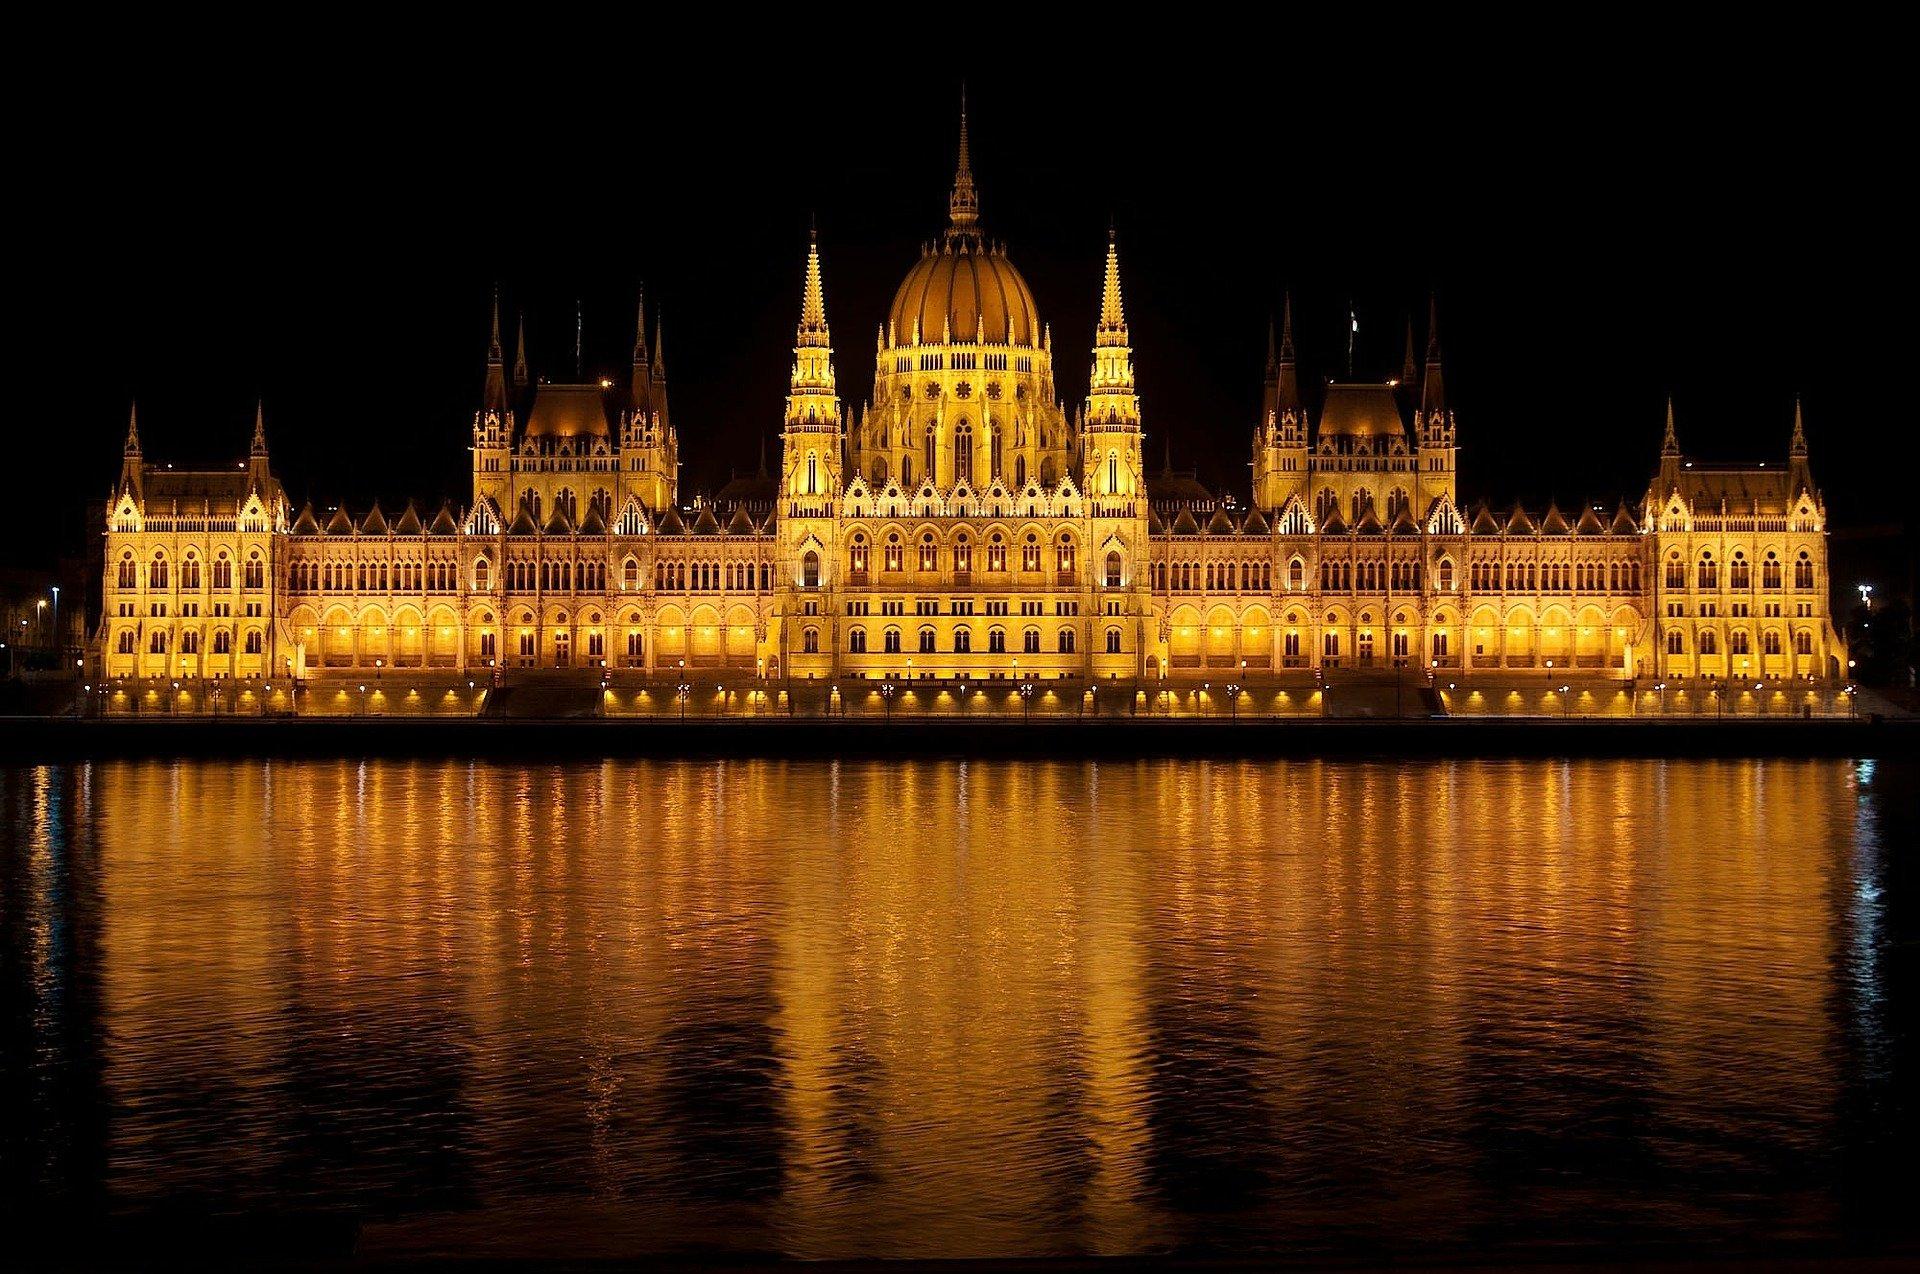 Parlament in Budapest bei Nacht